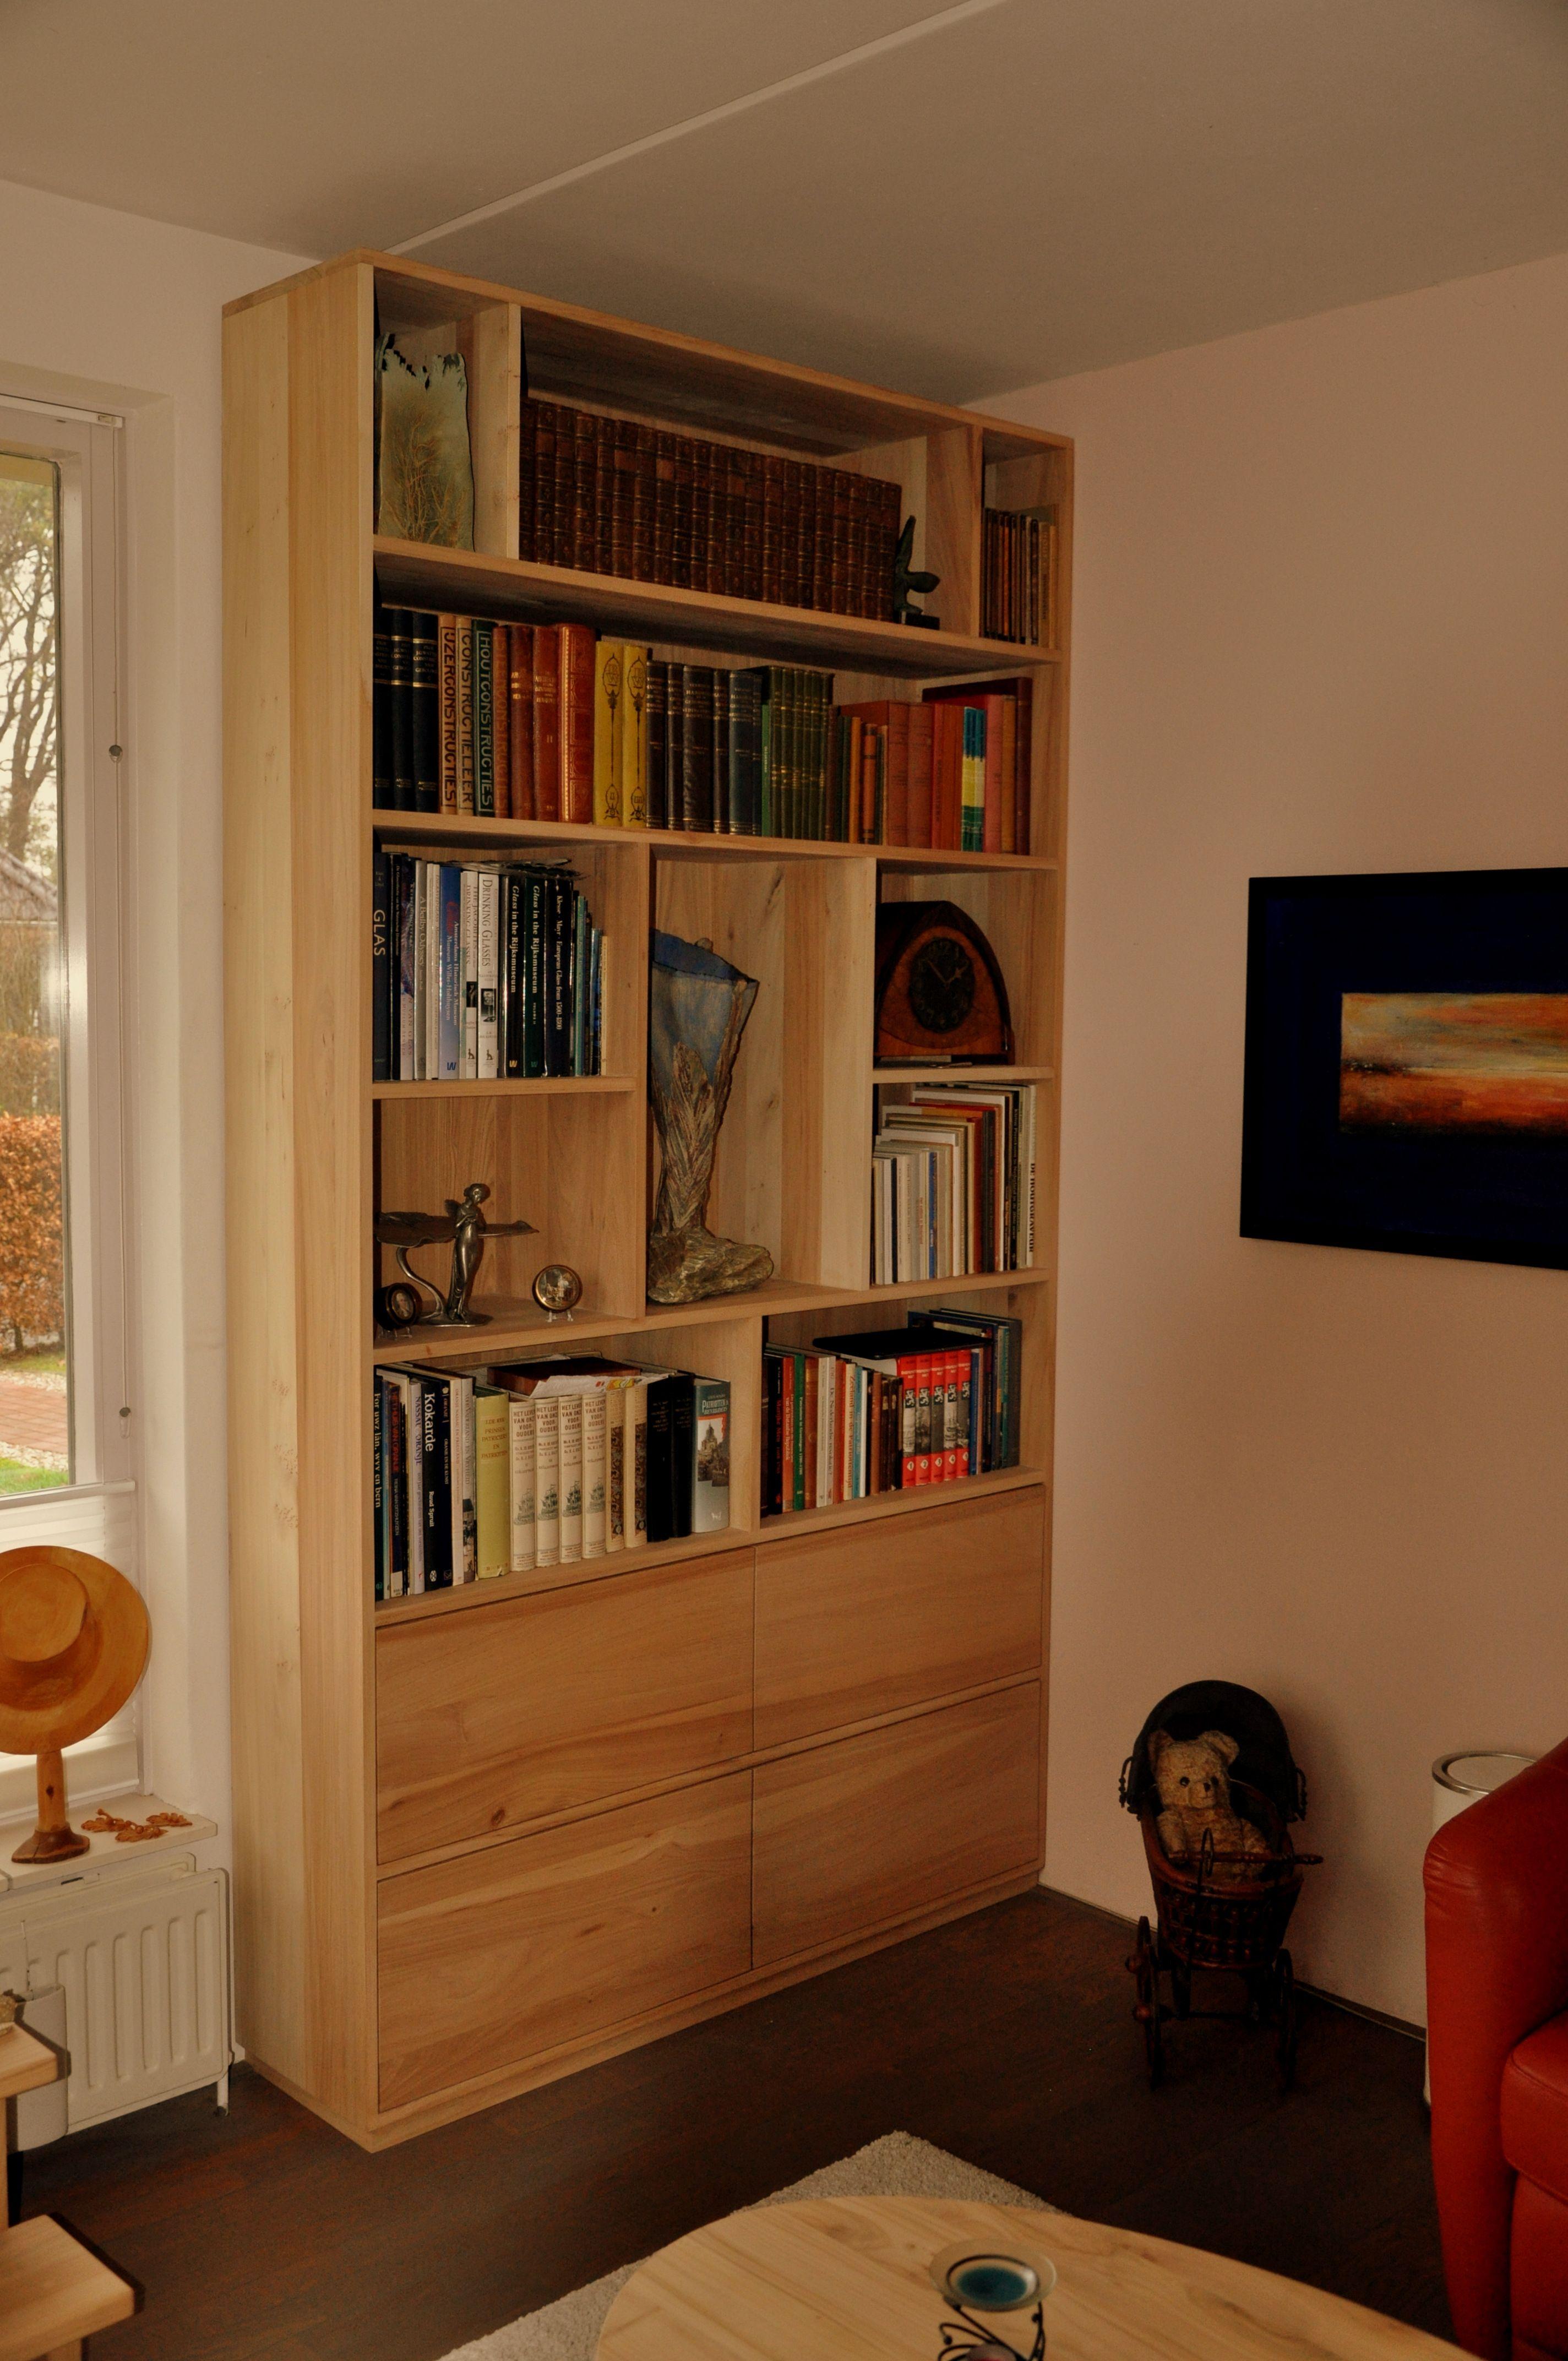 Opmaat Gemaakte Boekenkasten Deze Kast Die Afgebeeld Staat